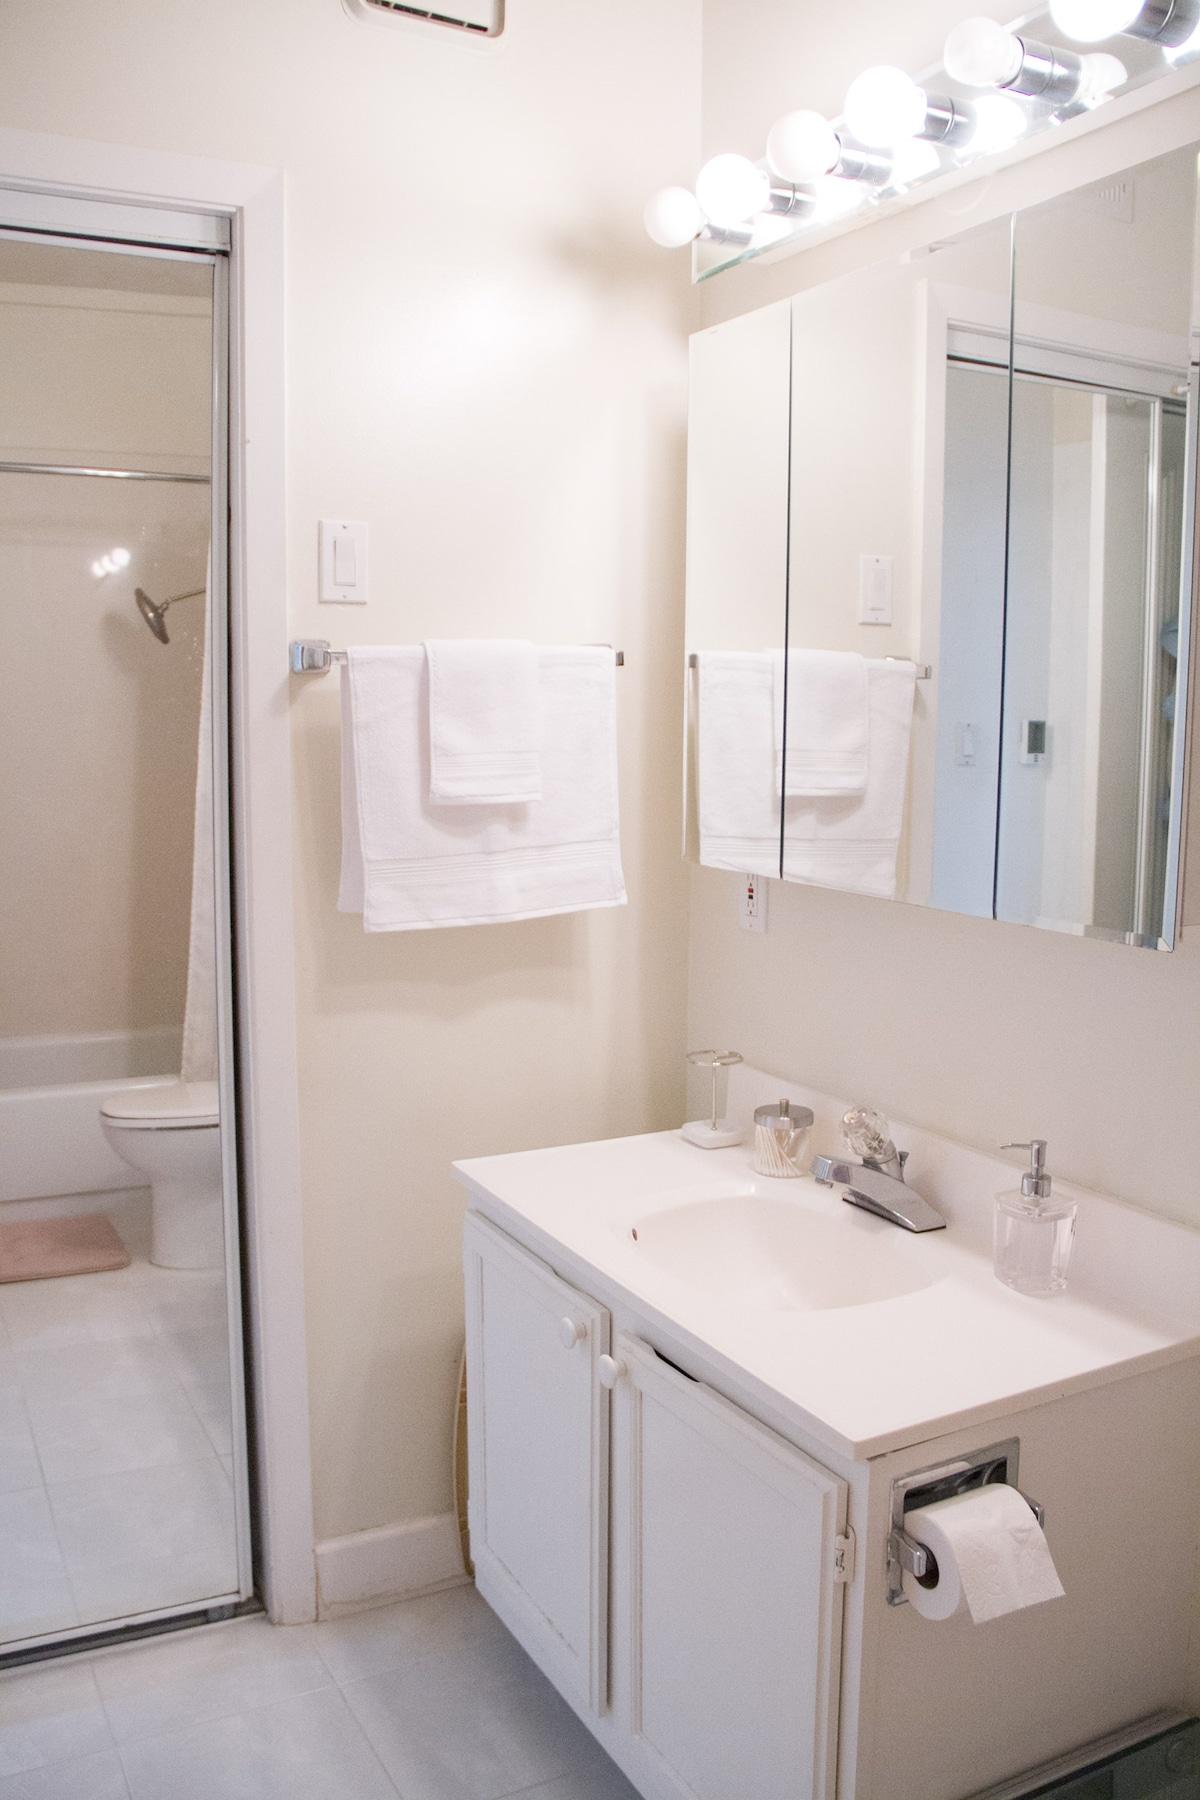 Private bathroom with Rainshower shower head